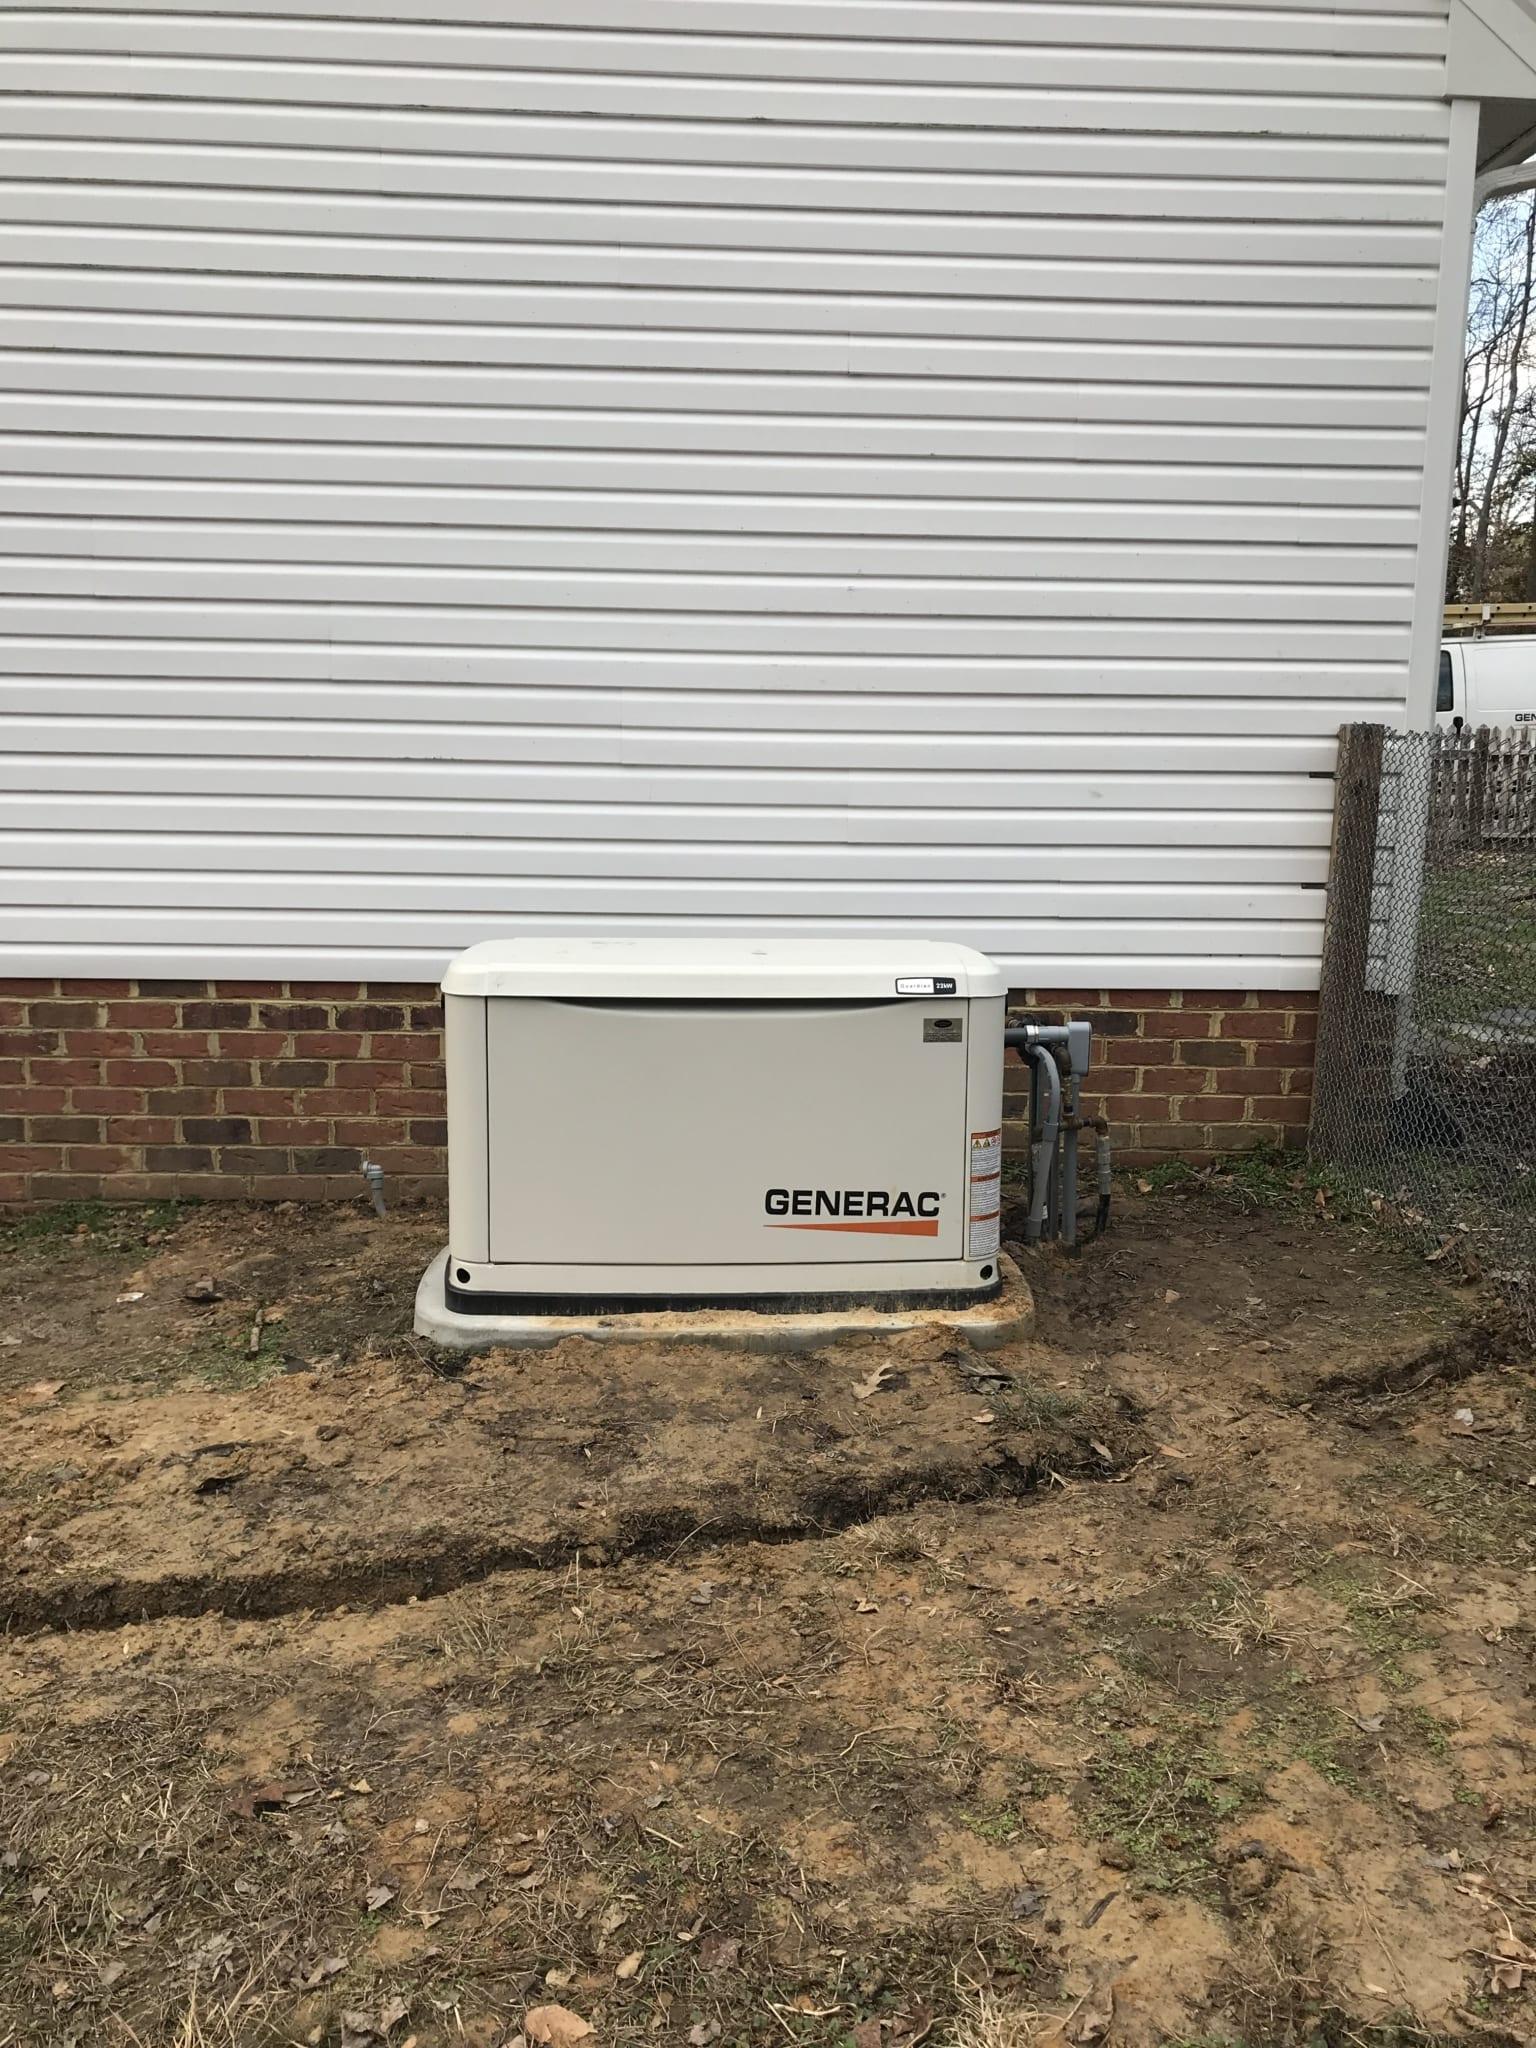 1.10.20 Hopewell Generac Automatic Standby Generator